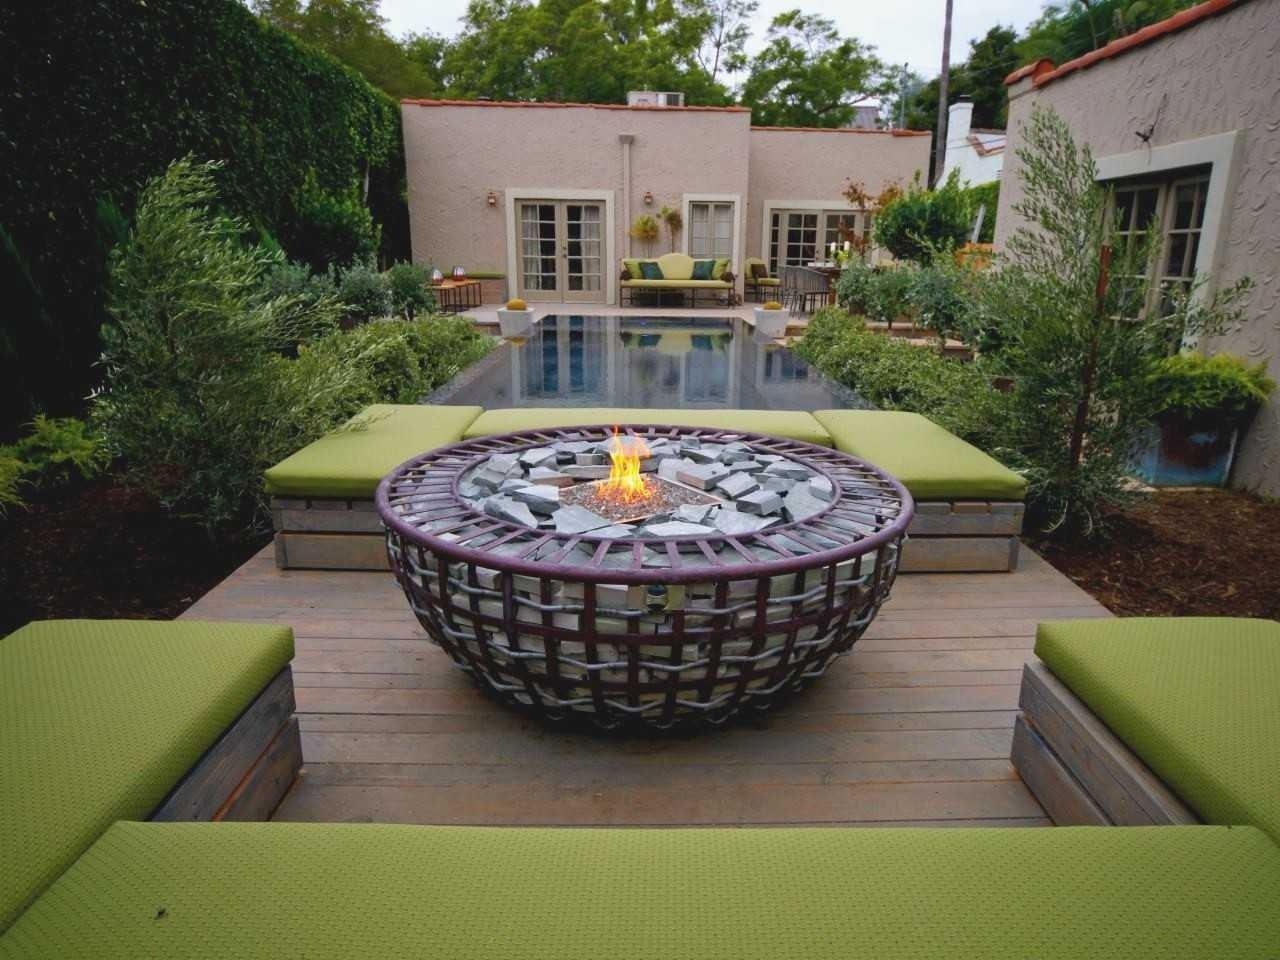 10 Great Outdoor Fire Pit Ideas Backyard outdoor fire pit ideas backyard elegant 66 fire pit and outdoor 2020